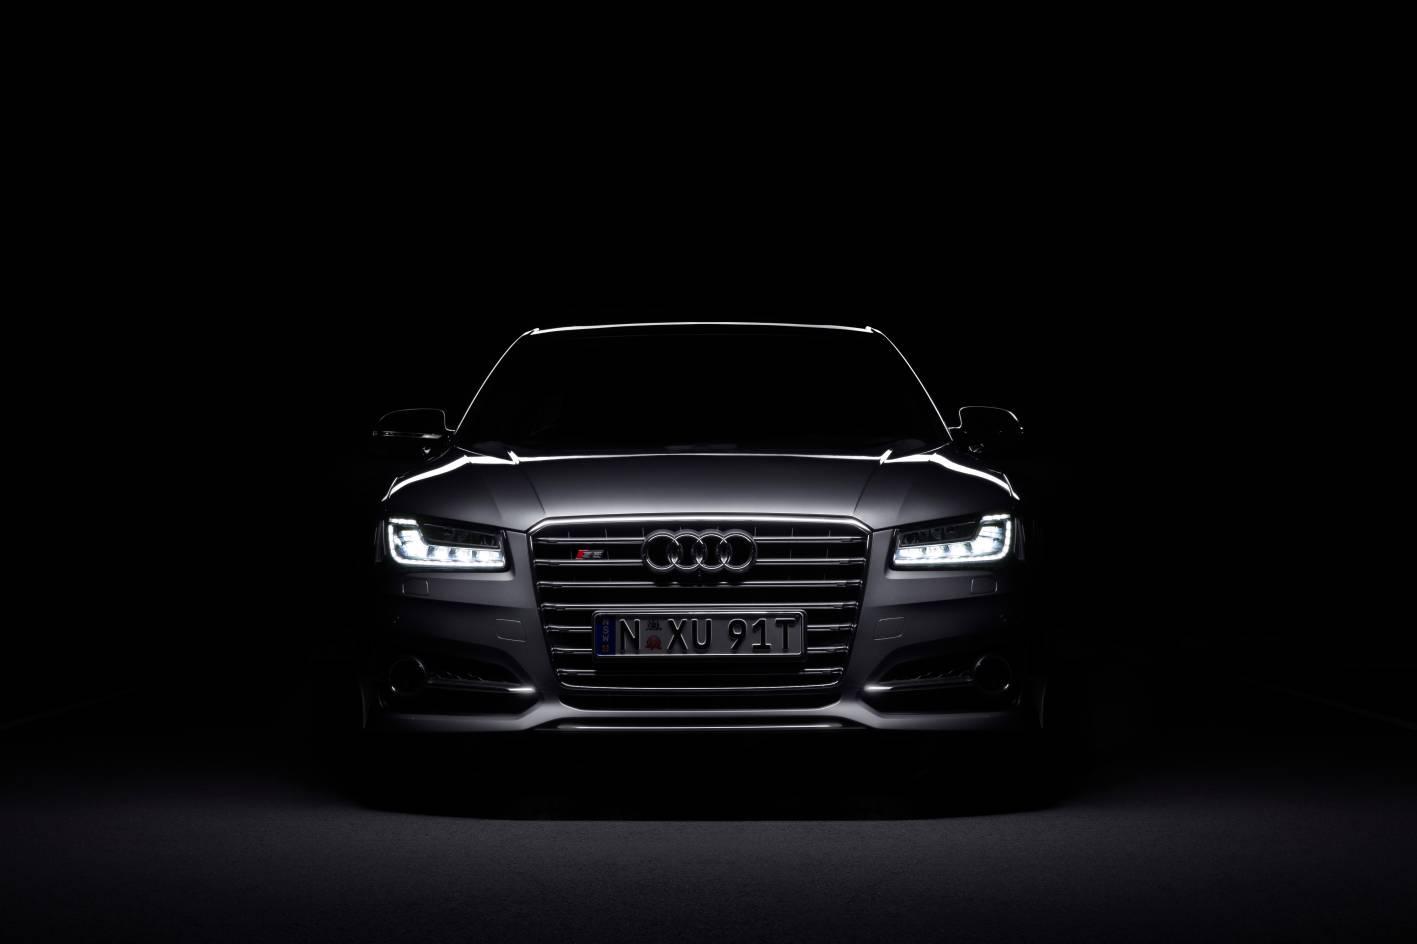 Audi Cars News 2014 S8 Arrives In Australia From 279 000